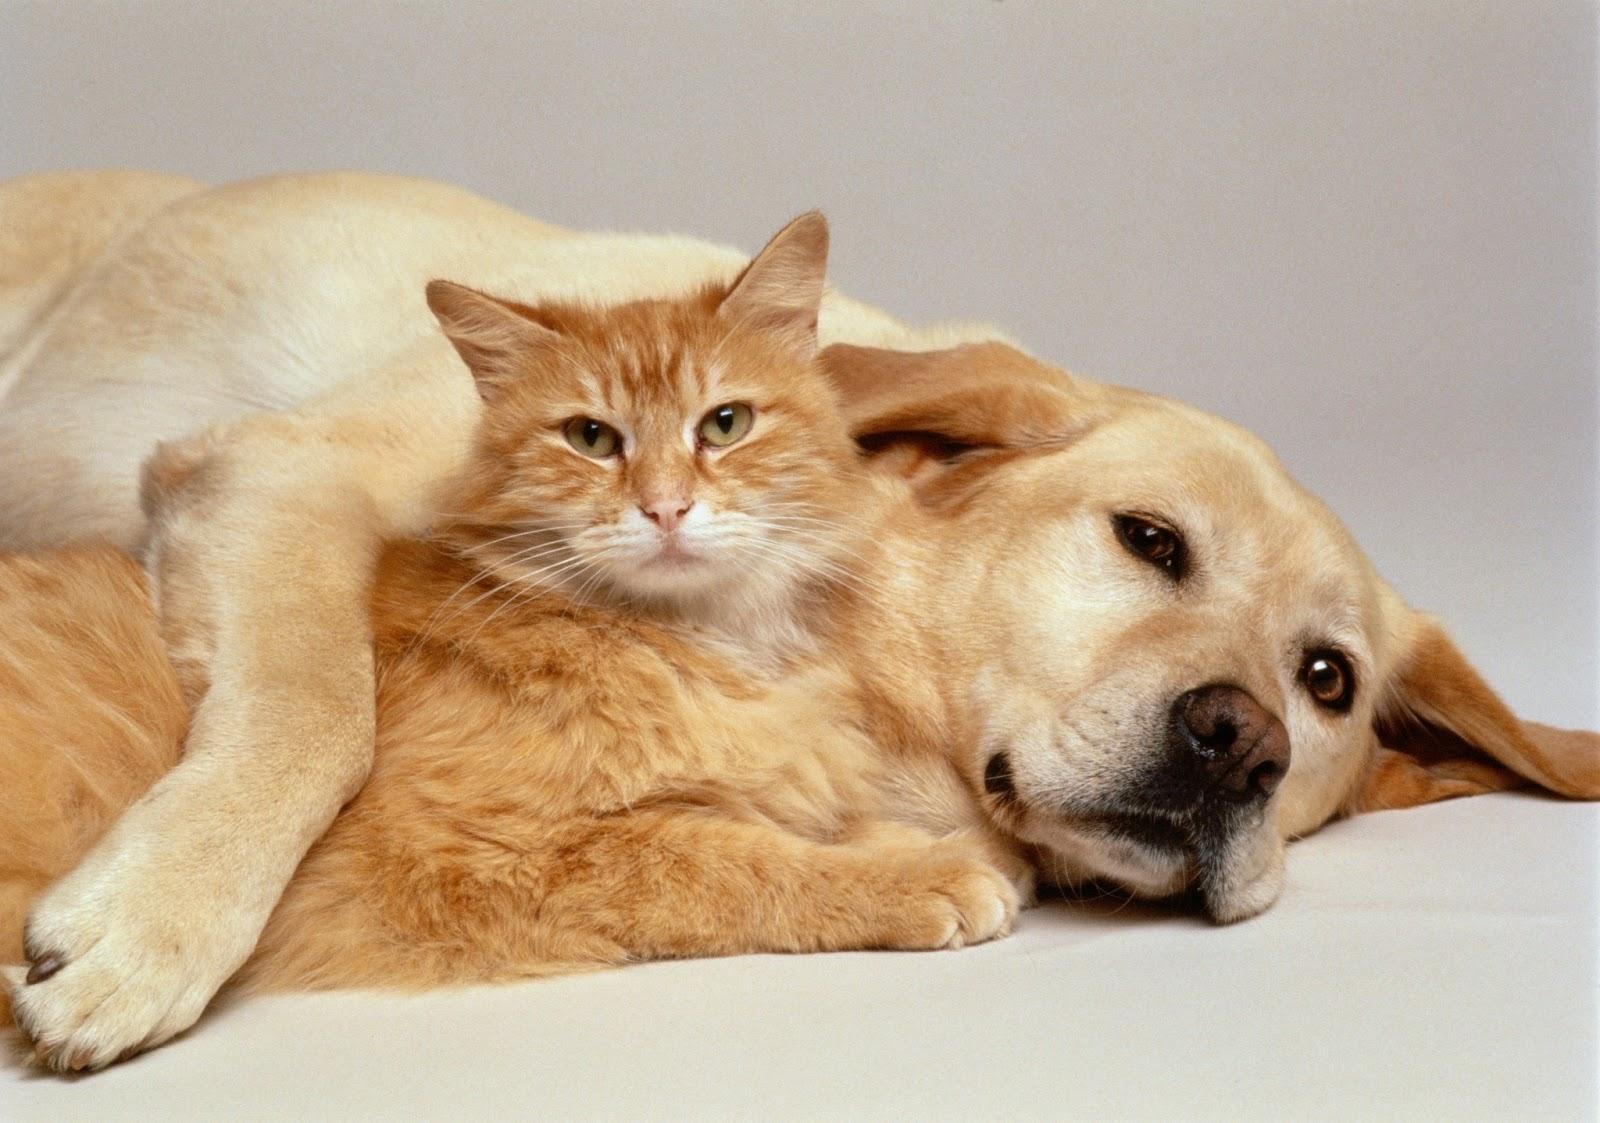 بالصور قطط وكلاب , صور اجمل قطط وكلاب اليفه وكيوت 4241